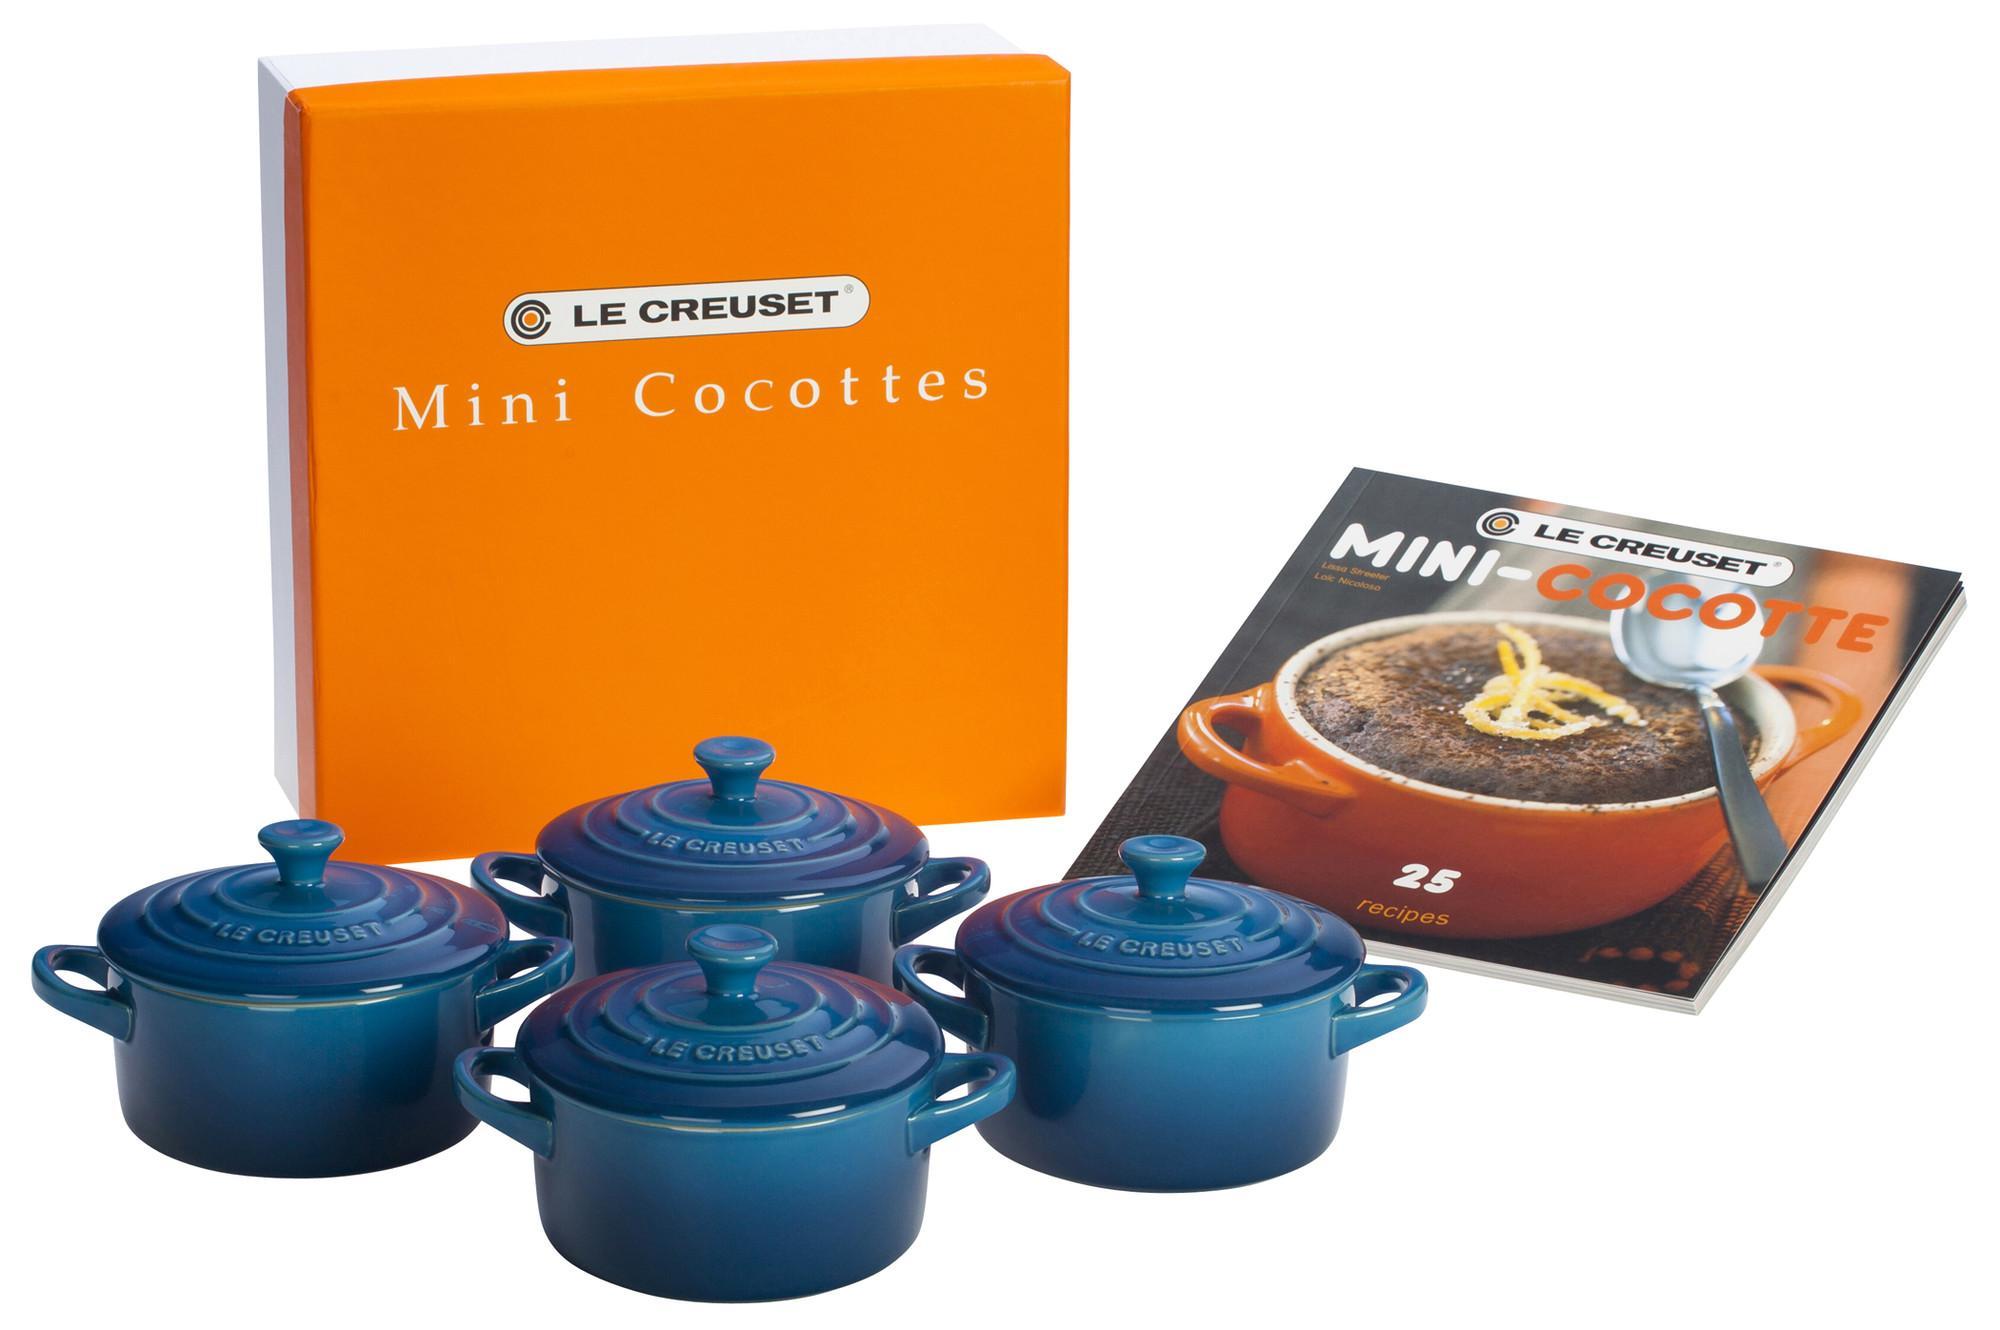 le creuset mini cocottes with cookbook palm set of 4. Black Bedroom Furniture Sets. Home Design Ideas